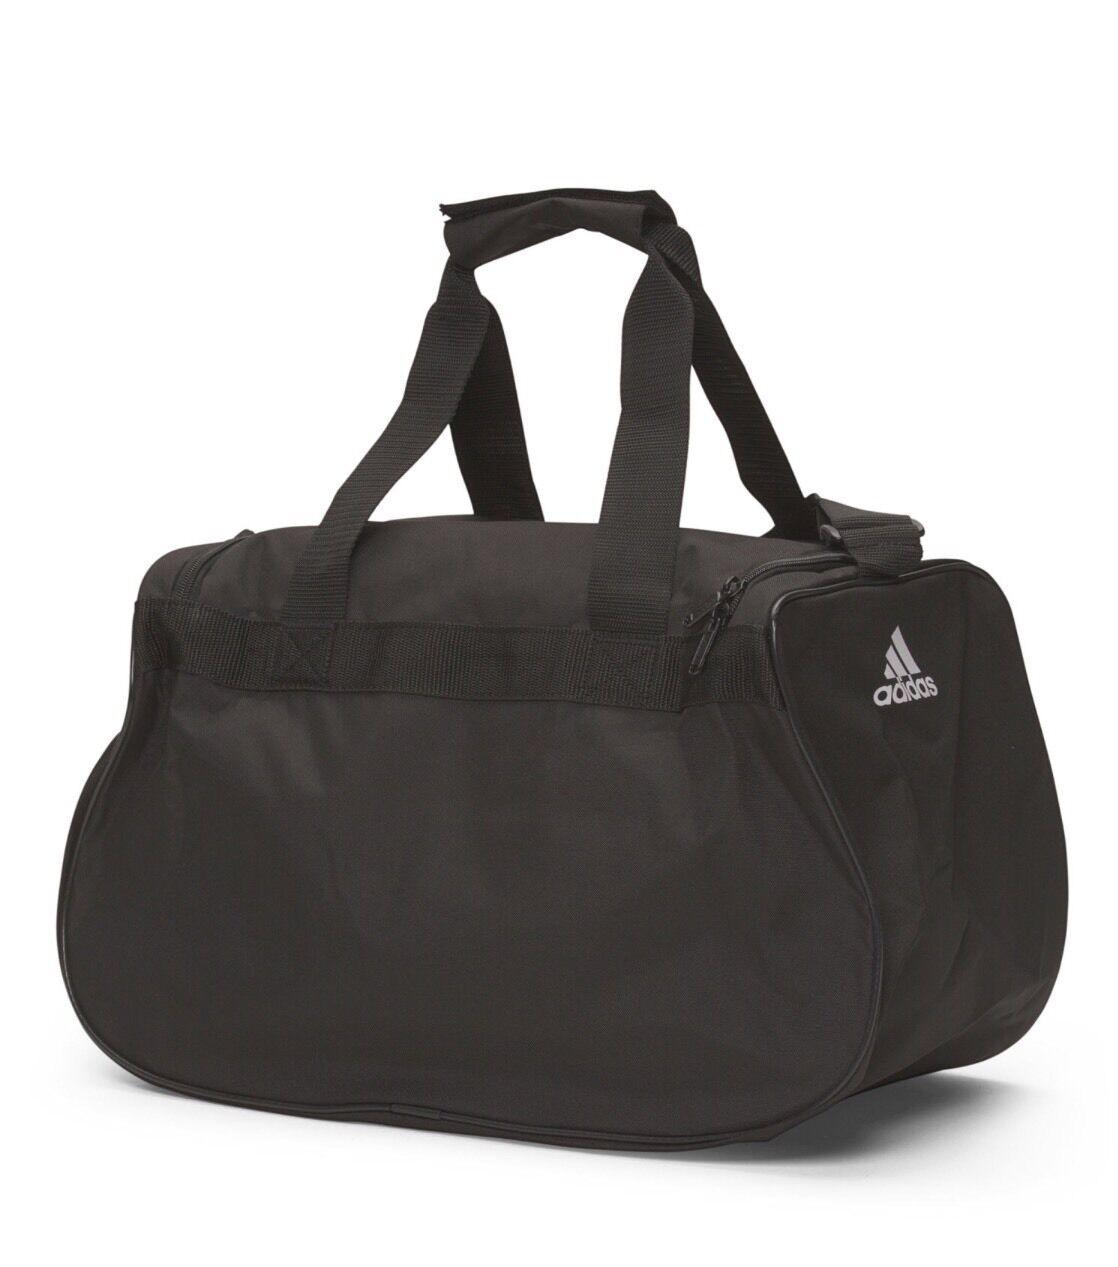 adidas Diablo Small Gym Sport Travel Duffel Bag - Black White for sale  online  bd55b0538fa04